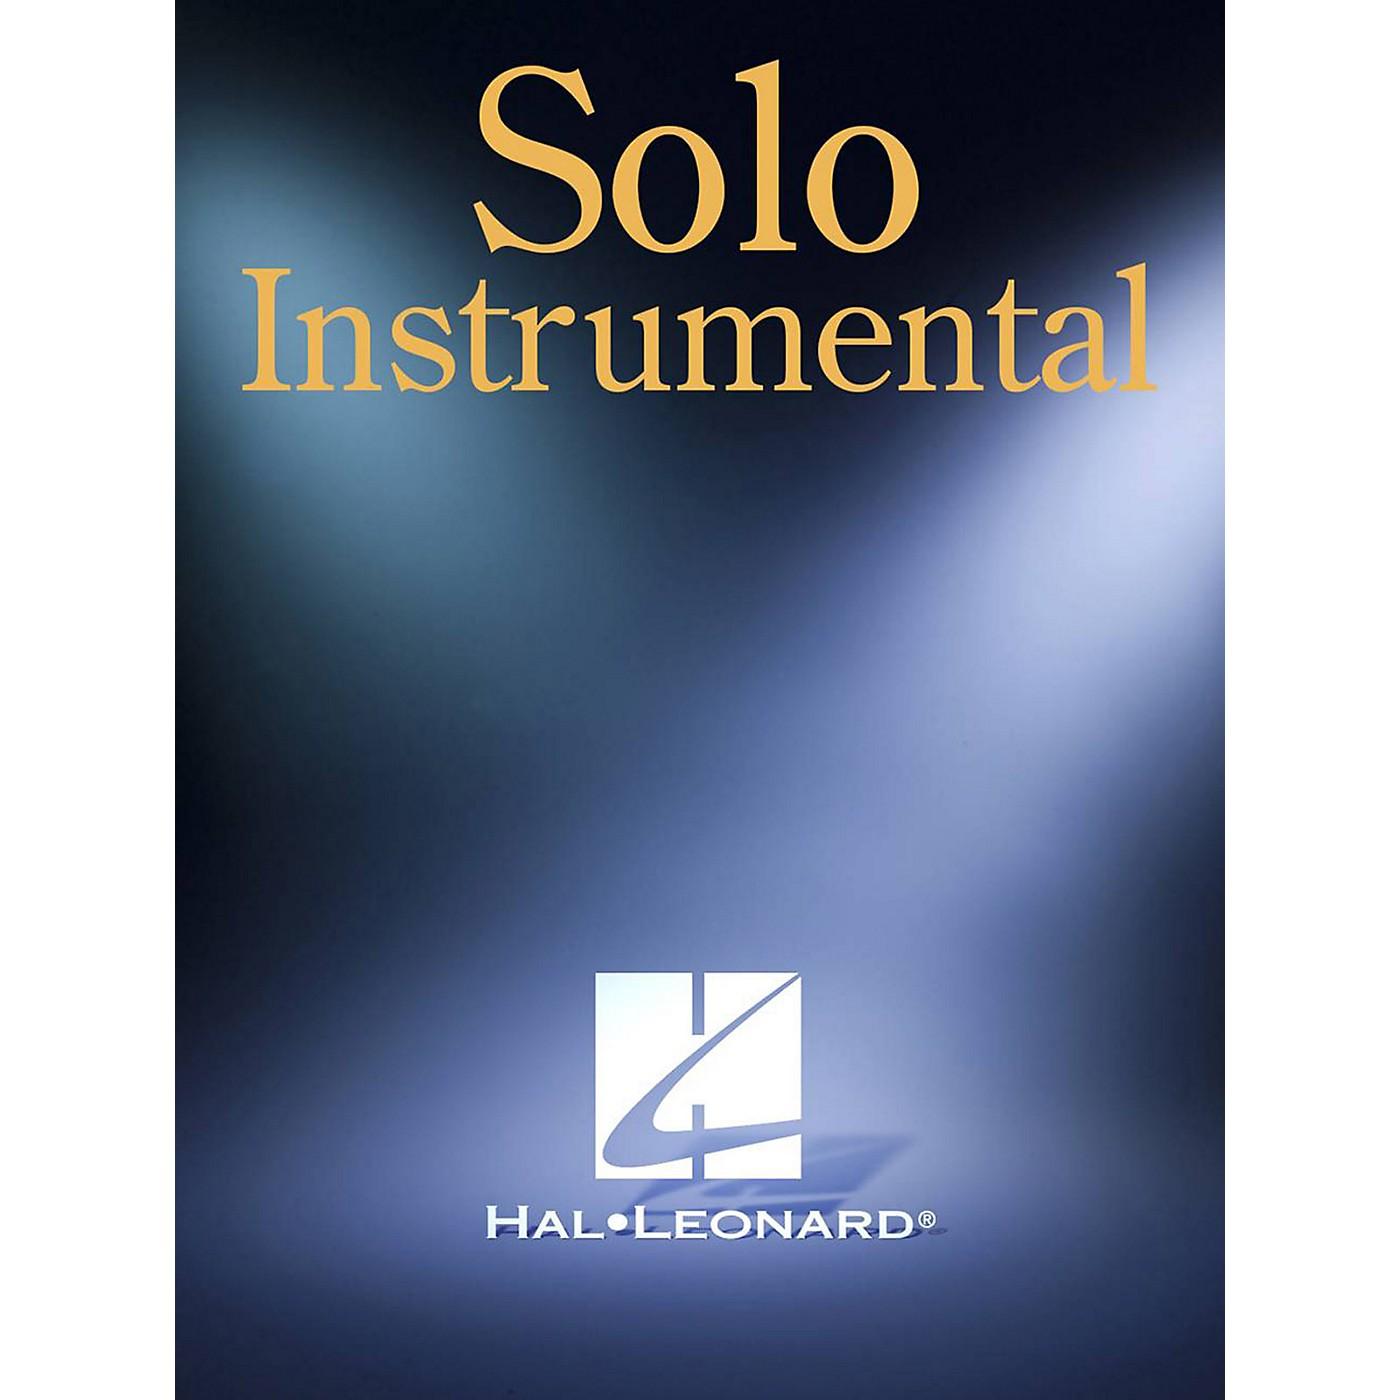 Hal Leonard The Lion King (Harmonica Songbook) Harmonica Series thumbnail